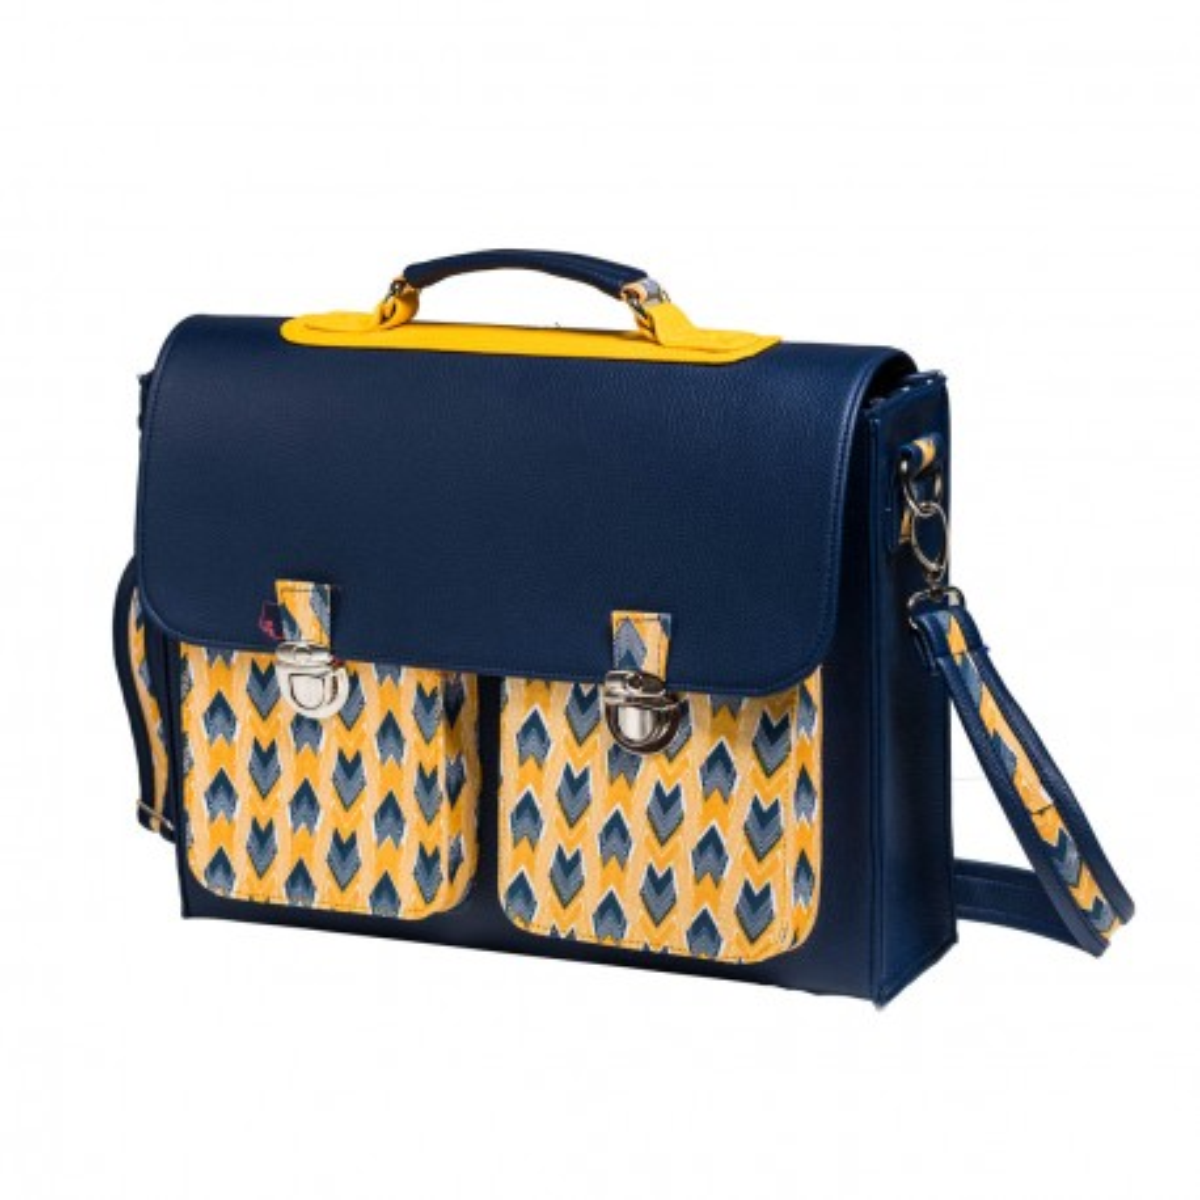 CCartable sacoche femme rétro jaunet bleu Panah